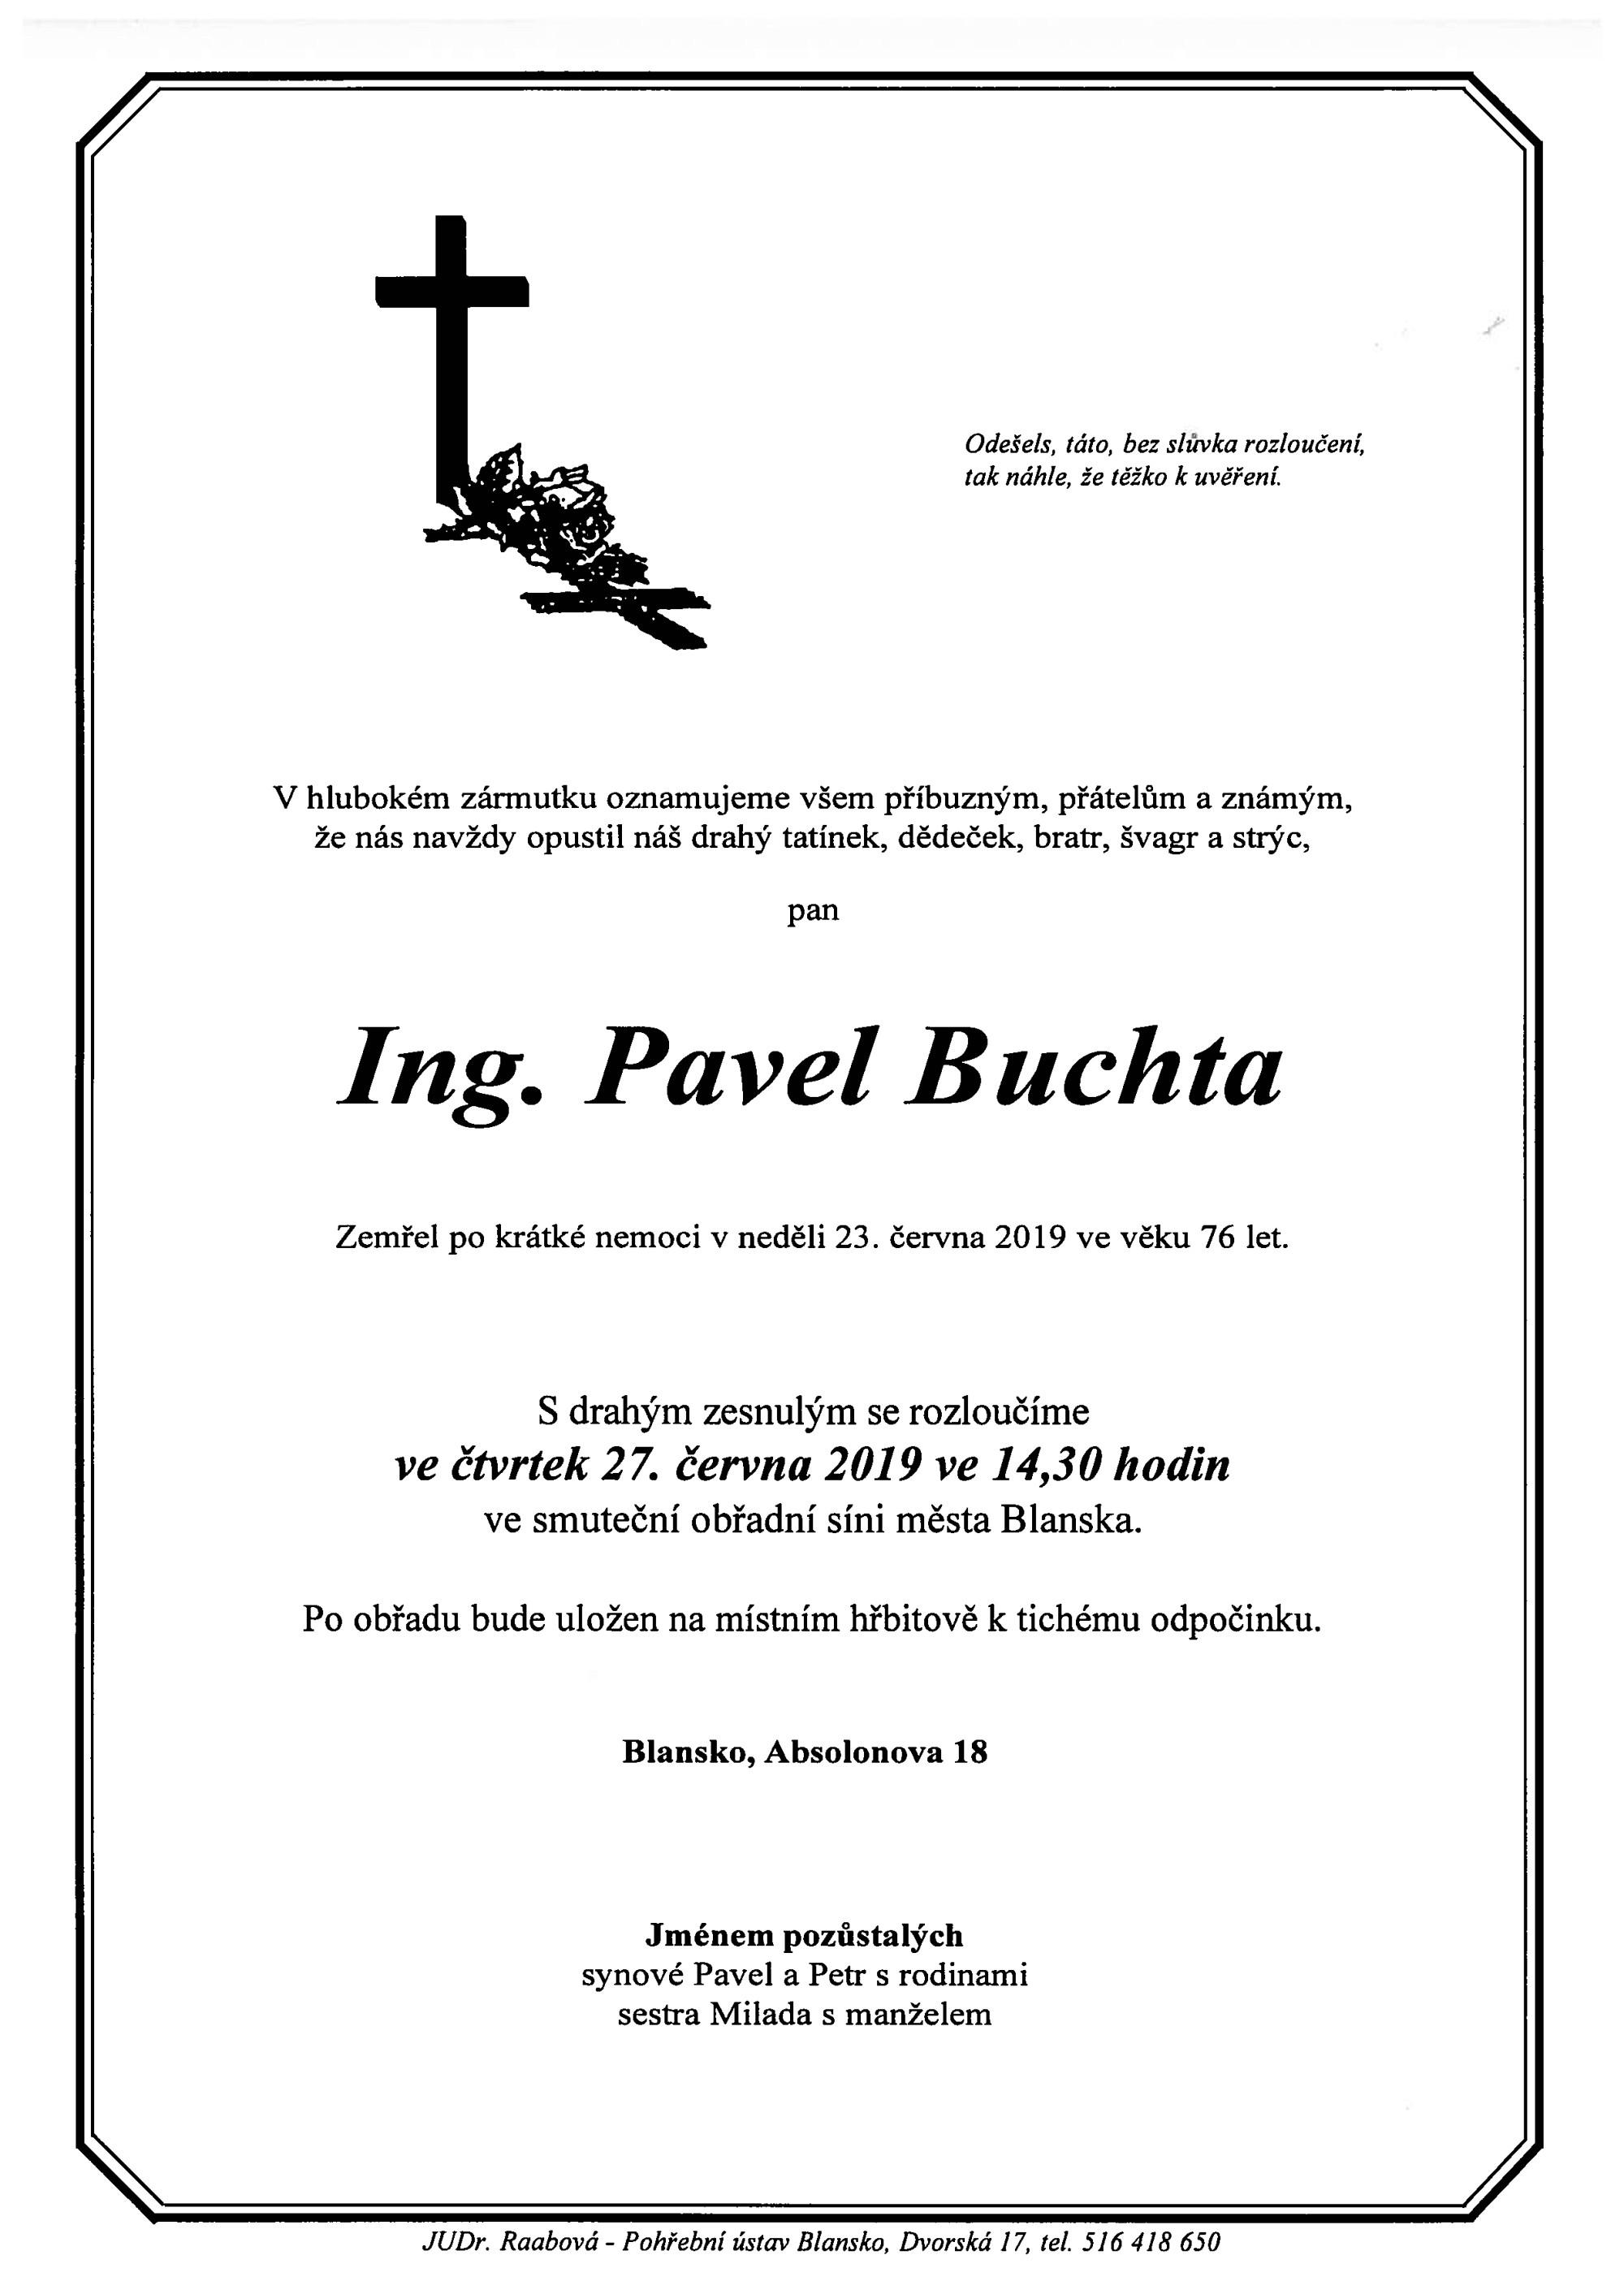 Ing. Pavel Buchta